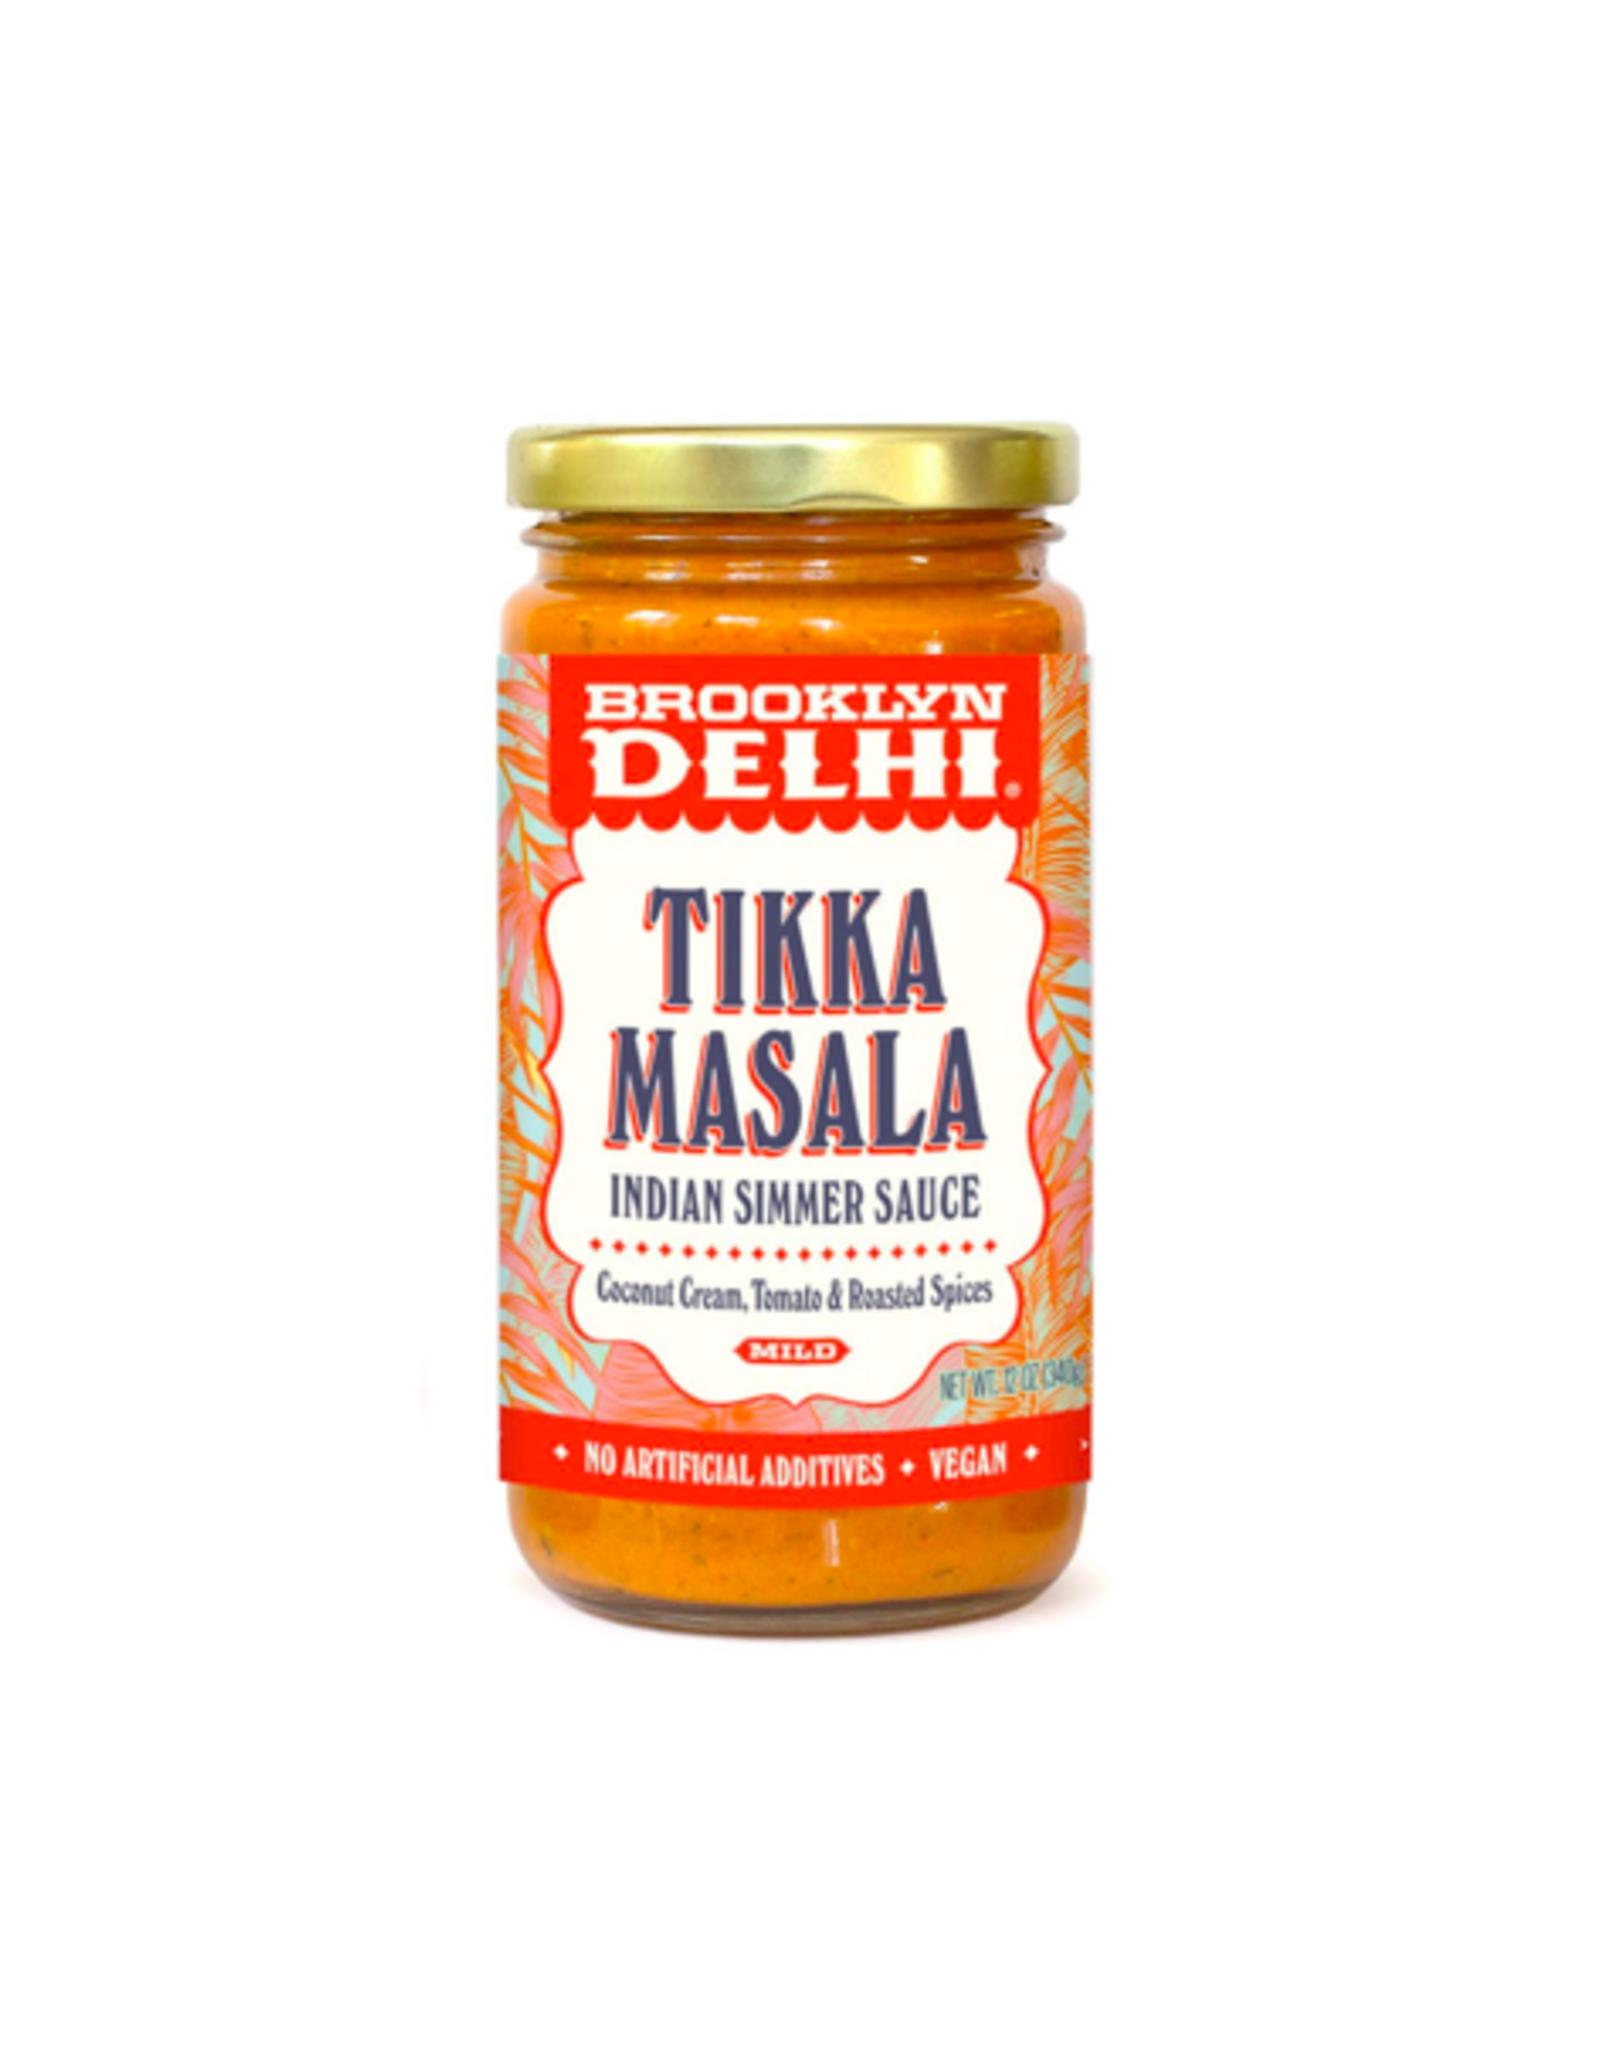 DLE - Brooklyn Delhi/Tikka Masala, 12oz